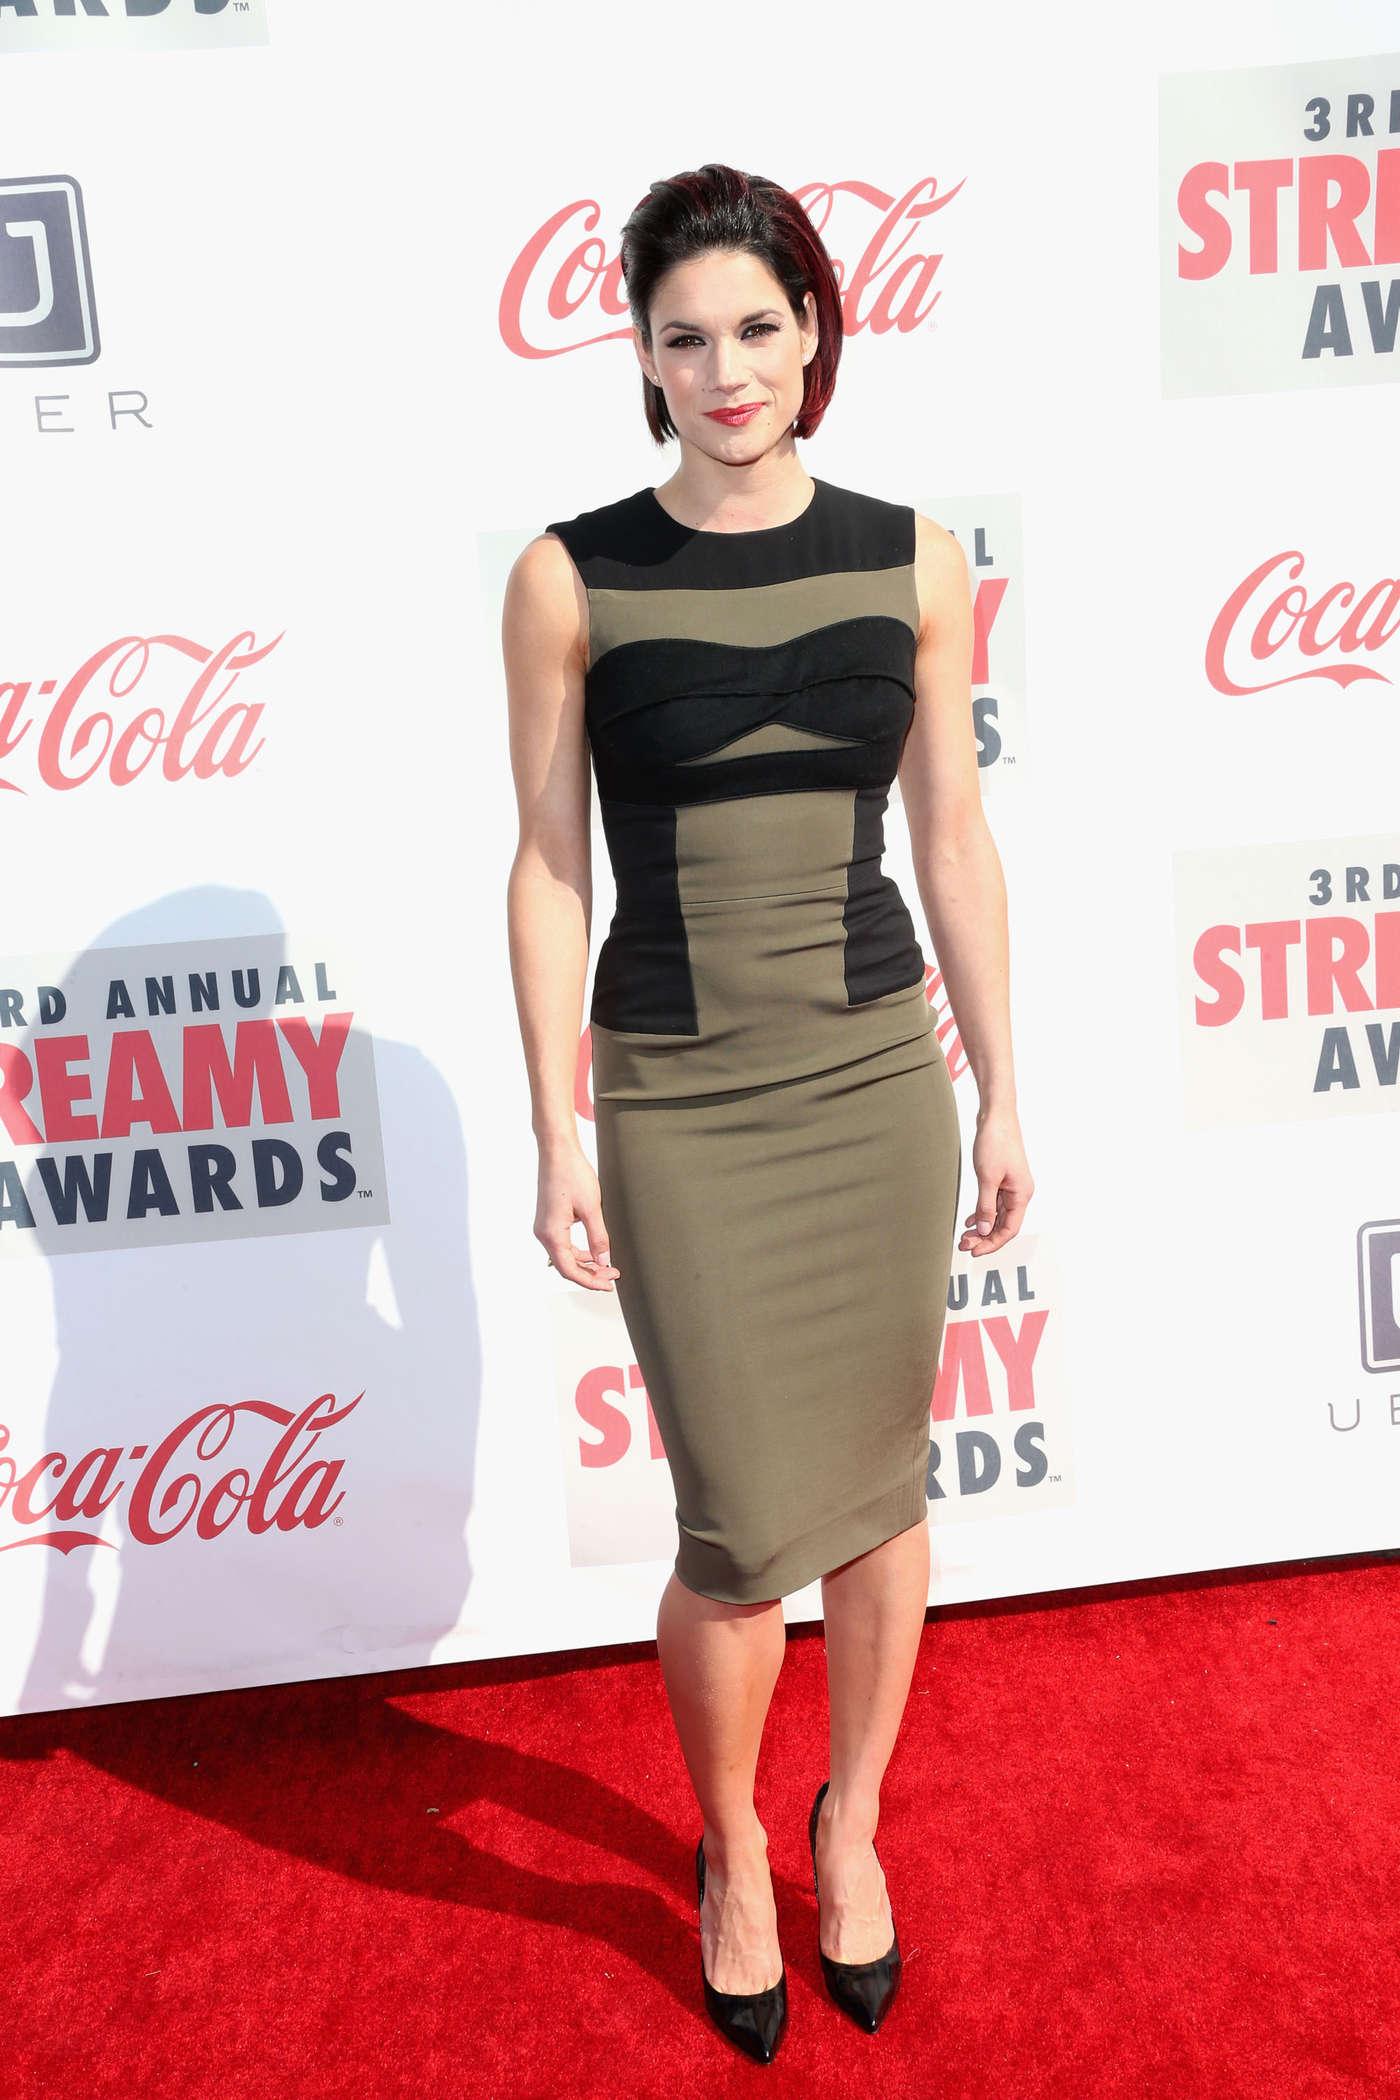 Missy Peregrym 2013 : Missy Peregrym – 2013 Streamy Awards -08